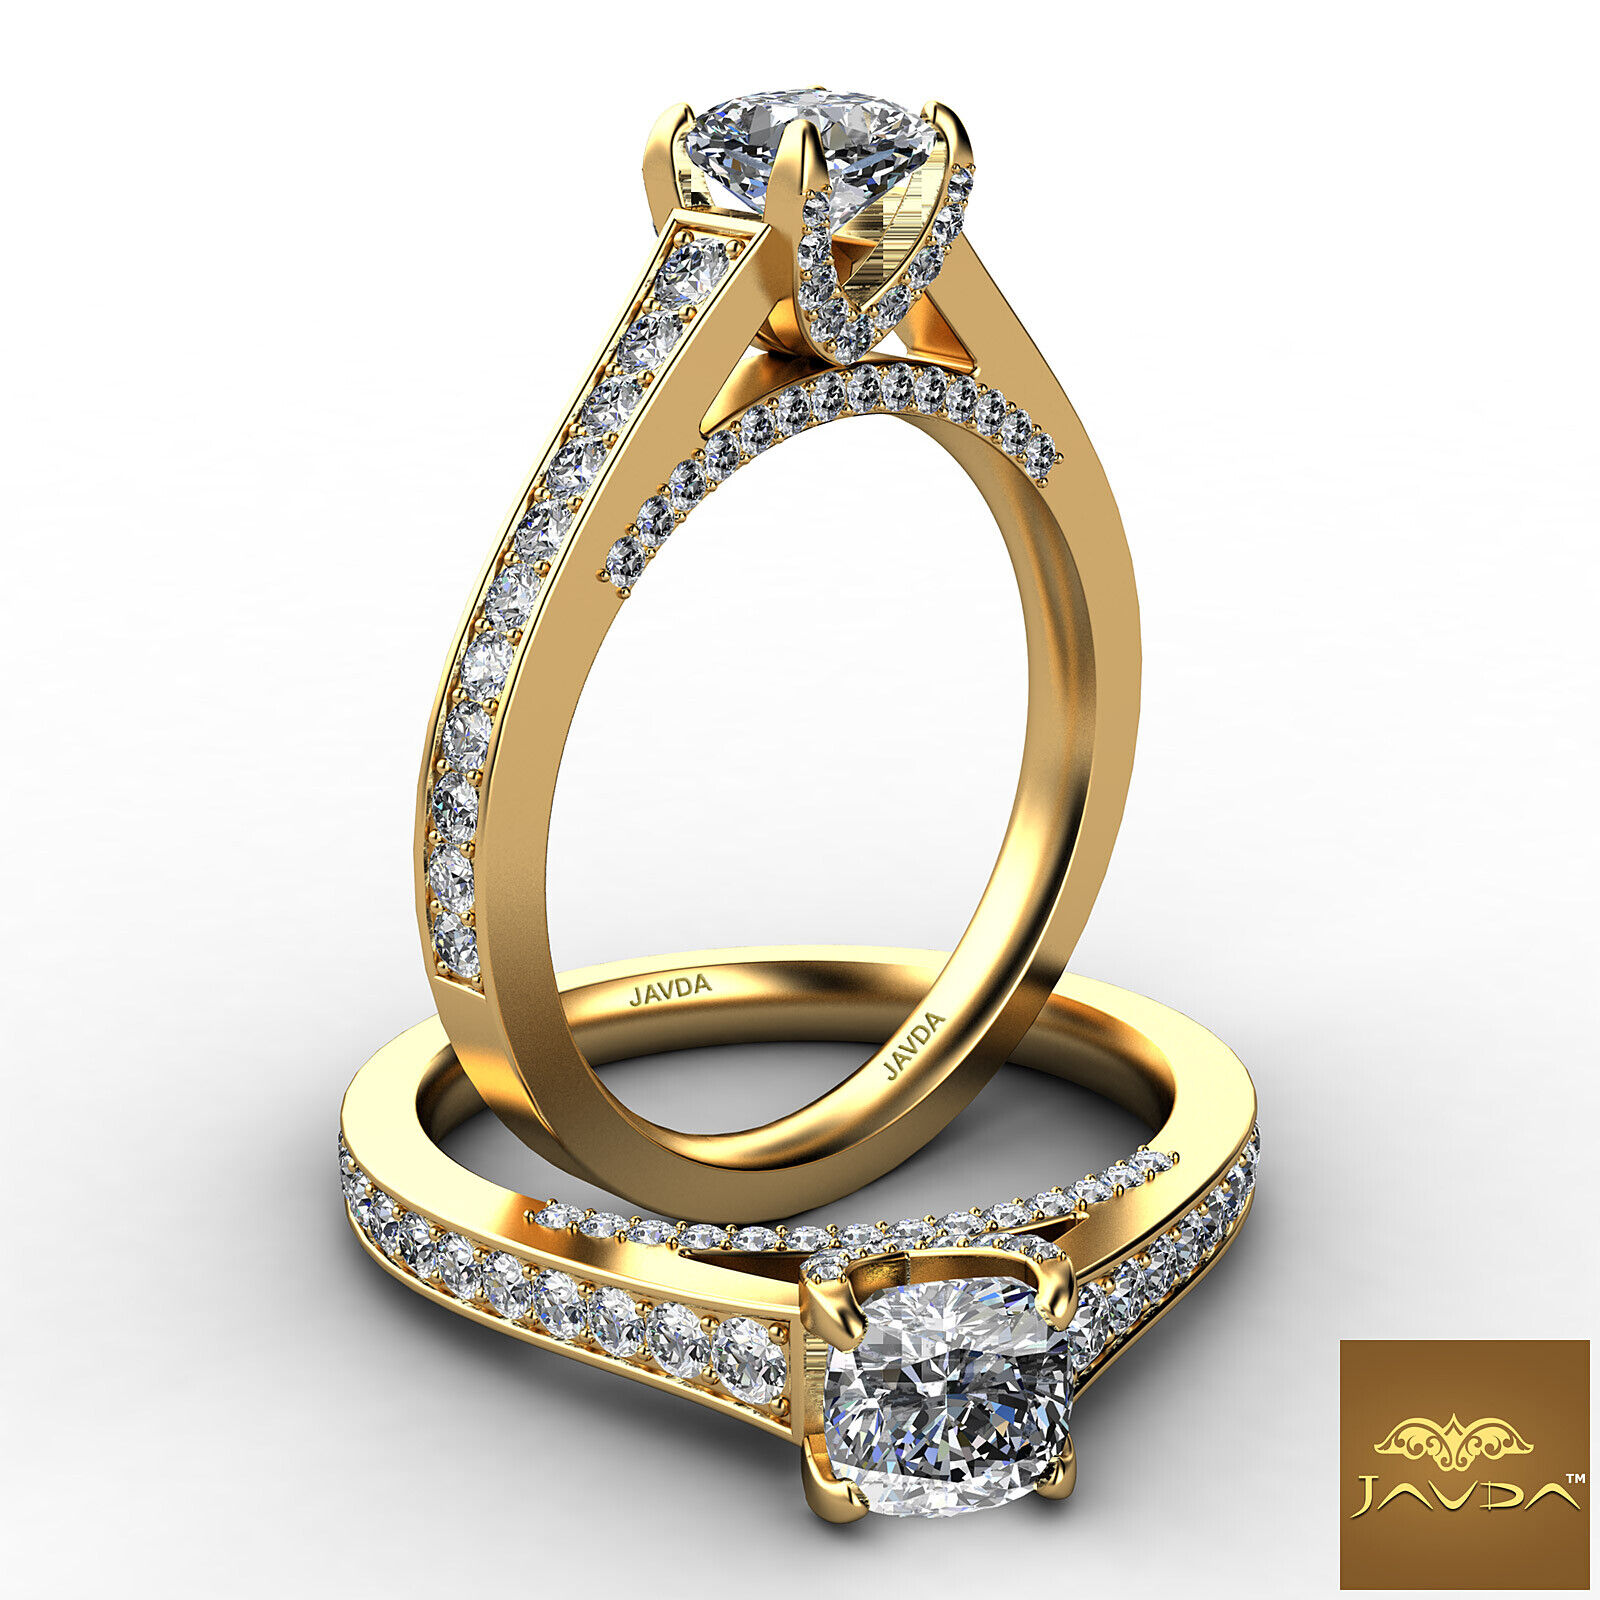 Cushion Cut Diamond Flawless Engagement GIA G VVS2 Pave Set Ring Platinum 1.25Ct 4